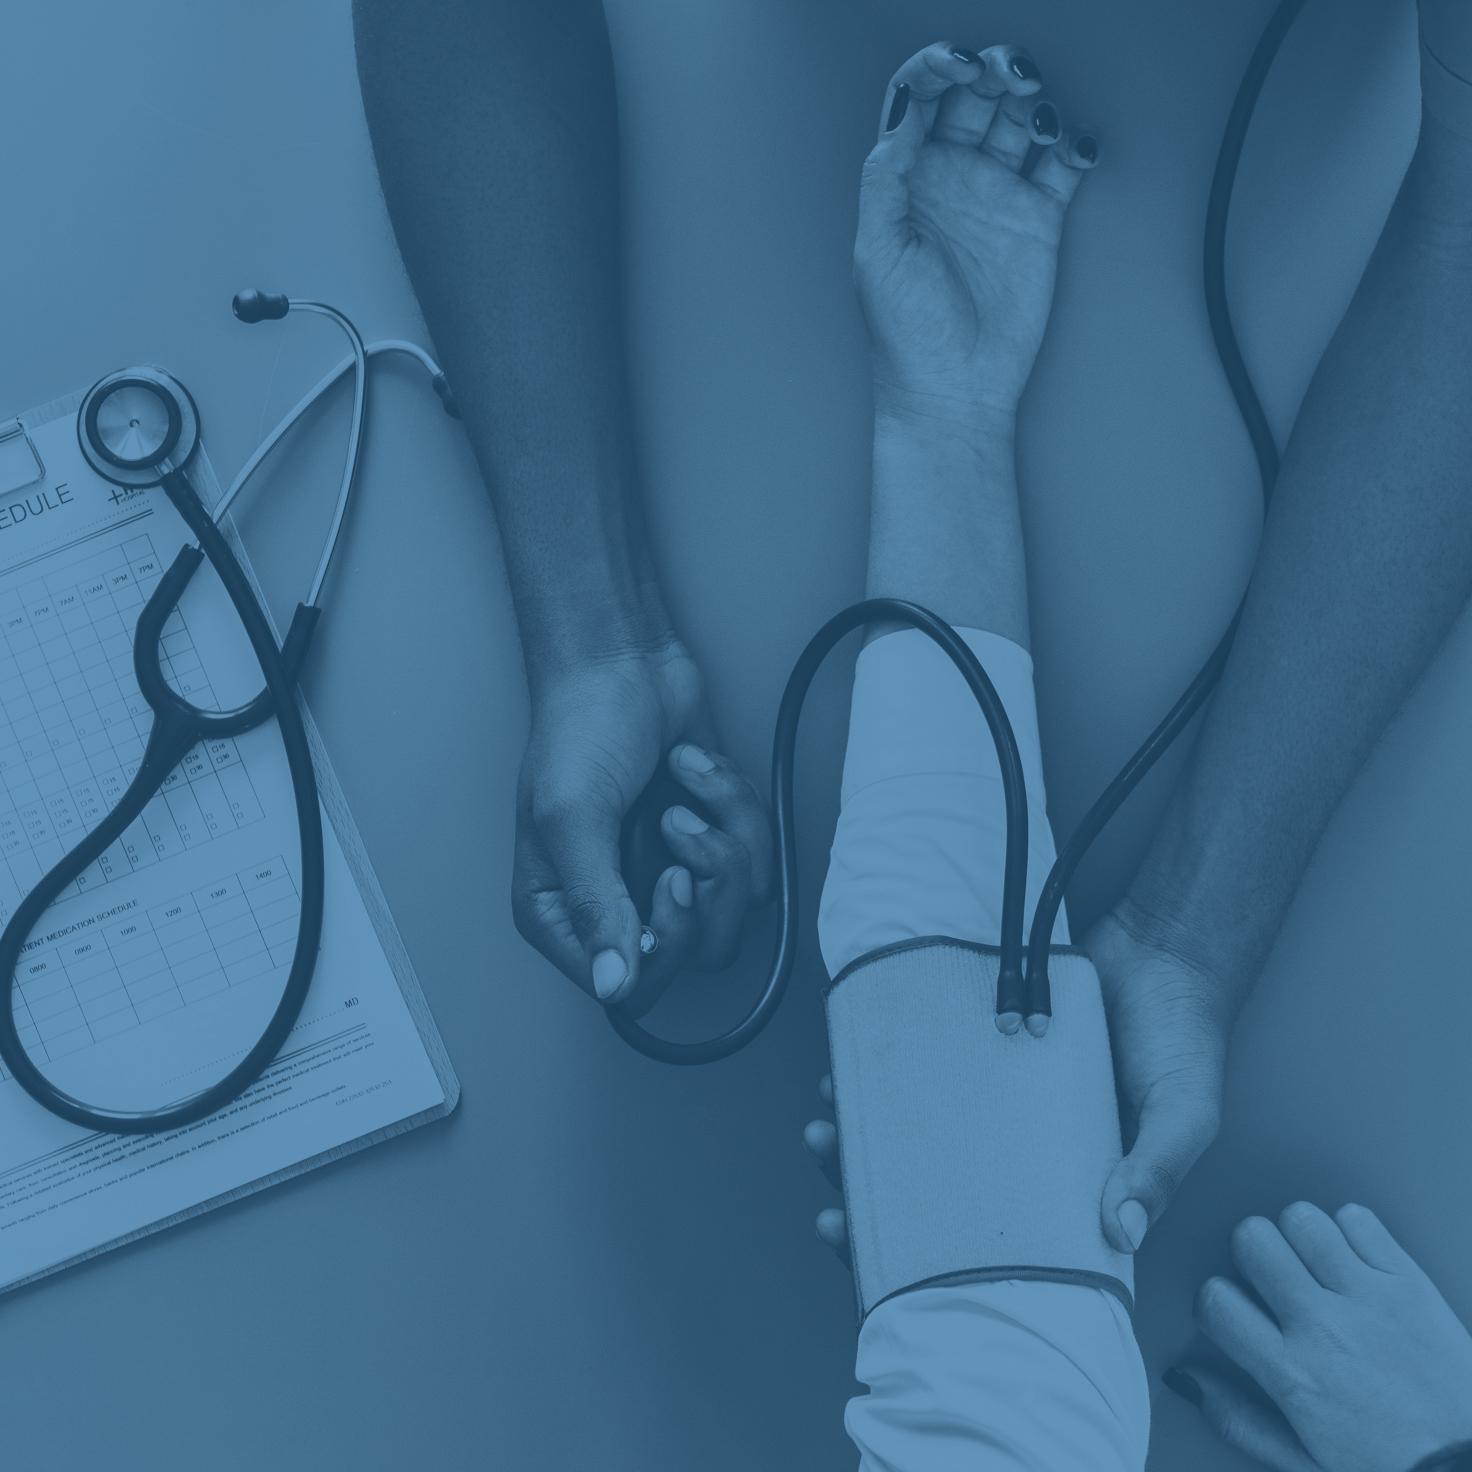 AFFORDABLE:HEALTHCAREFAMILY CARECAR INSURANCE -